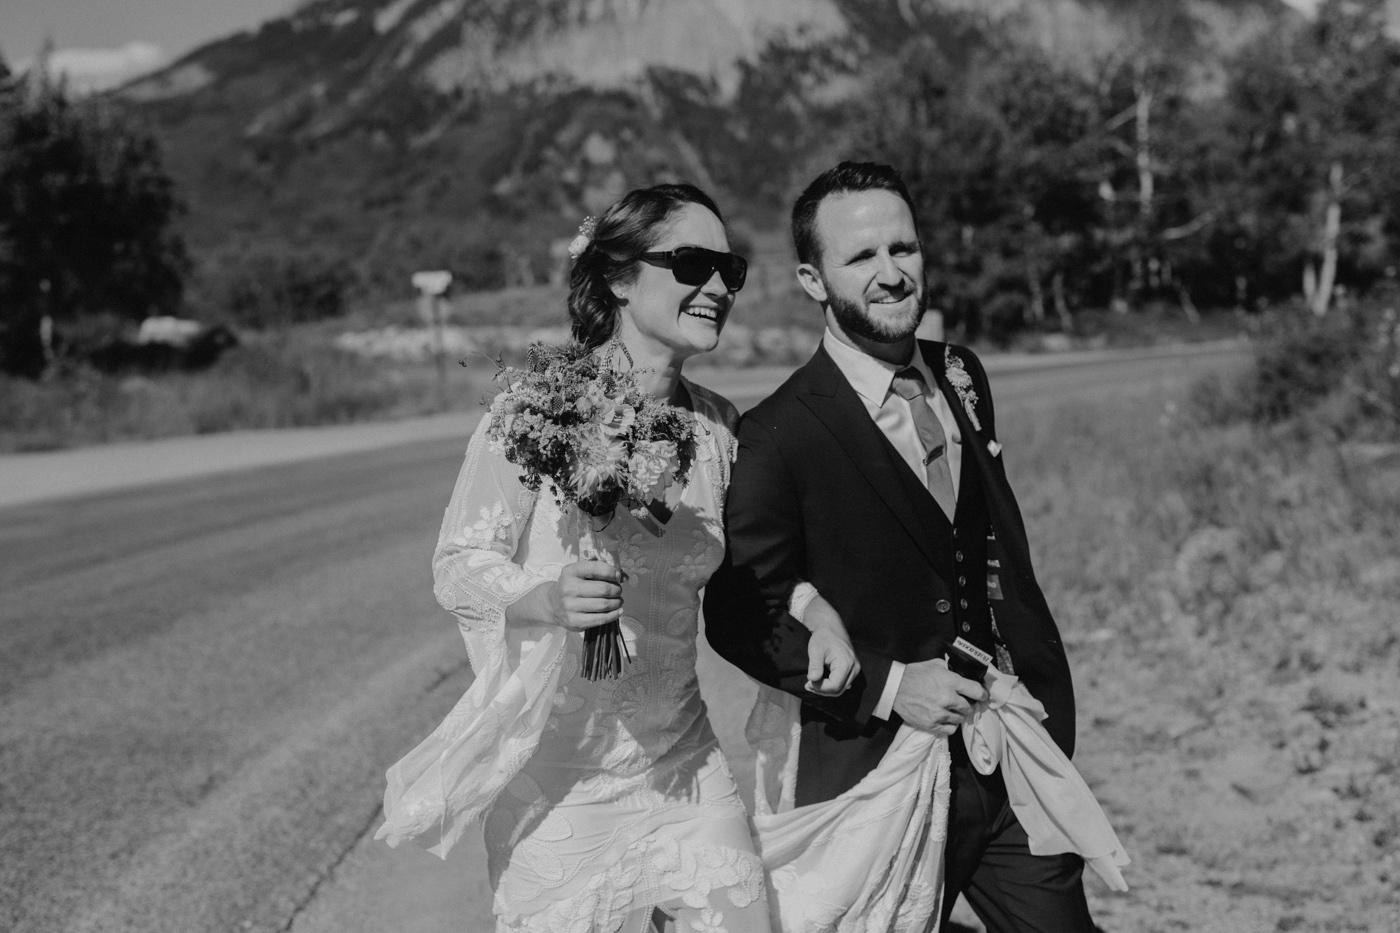 woods-walk-trail-crested-butte-colorado-wedding-74.jpg